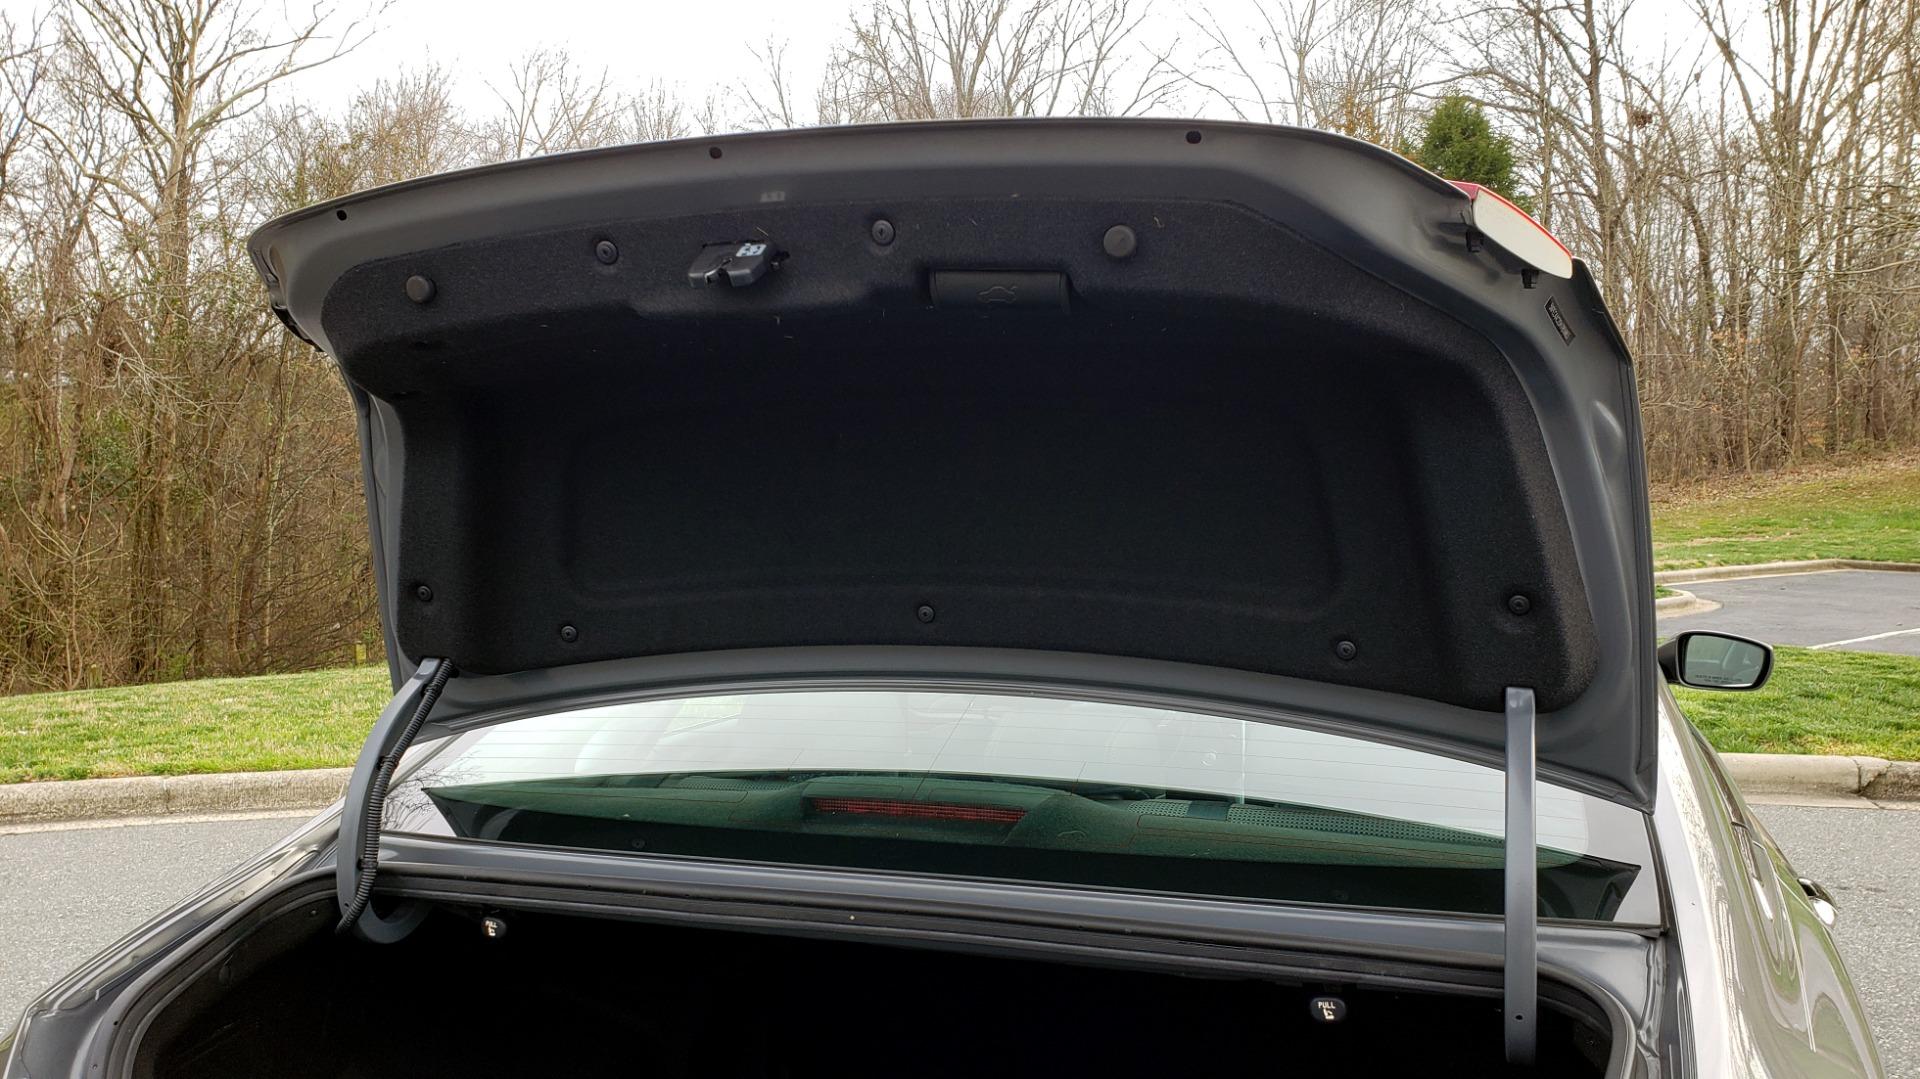 Used 2013 Hyundai SONATA SE AUTO / 2.4L 4-CYL / 6-SPD AUTO / VERY CLEAN for sale Sold at Formula Imports in Charlotte NC 28227 22